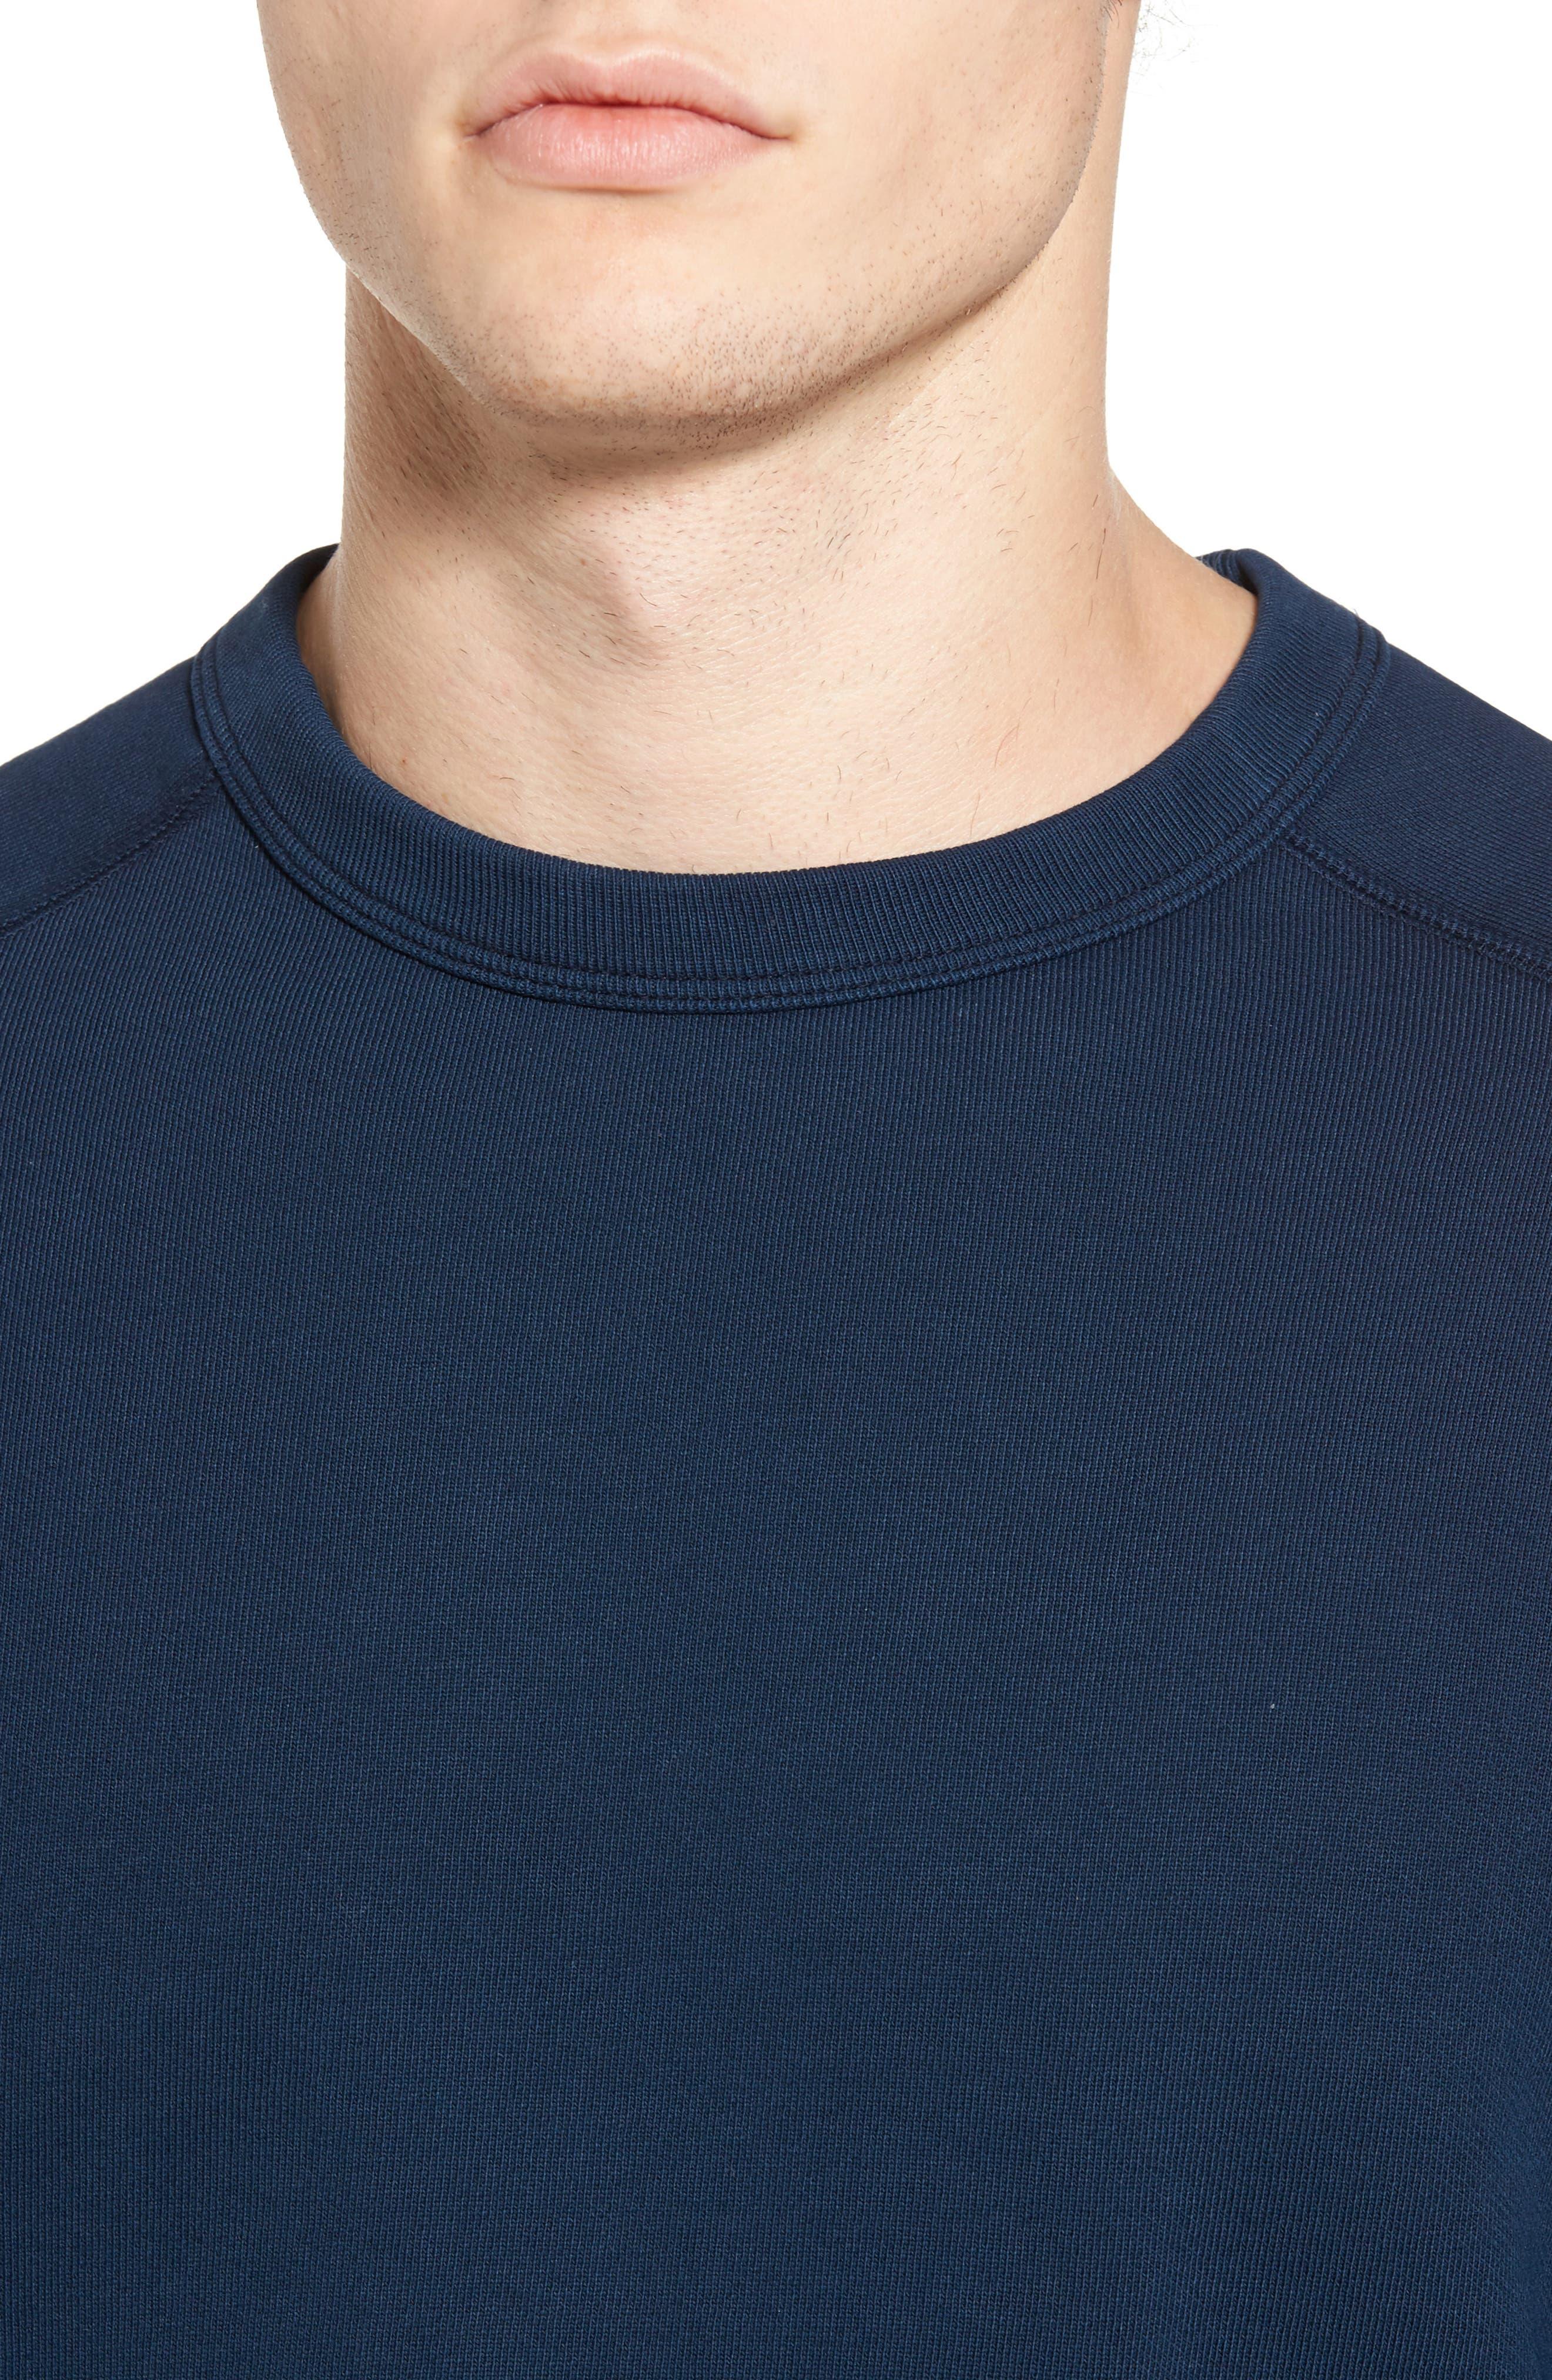 South Sea Raglan Sweatshirt,                             Alternate thumbnail 11, color,